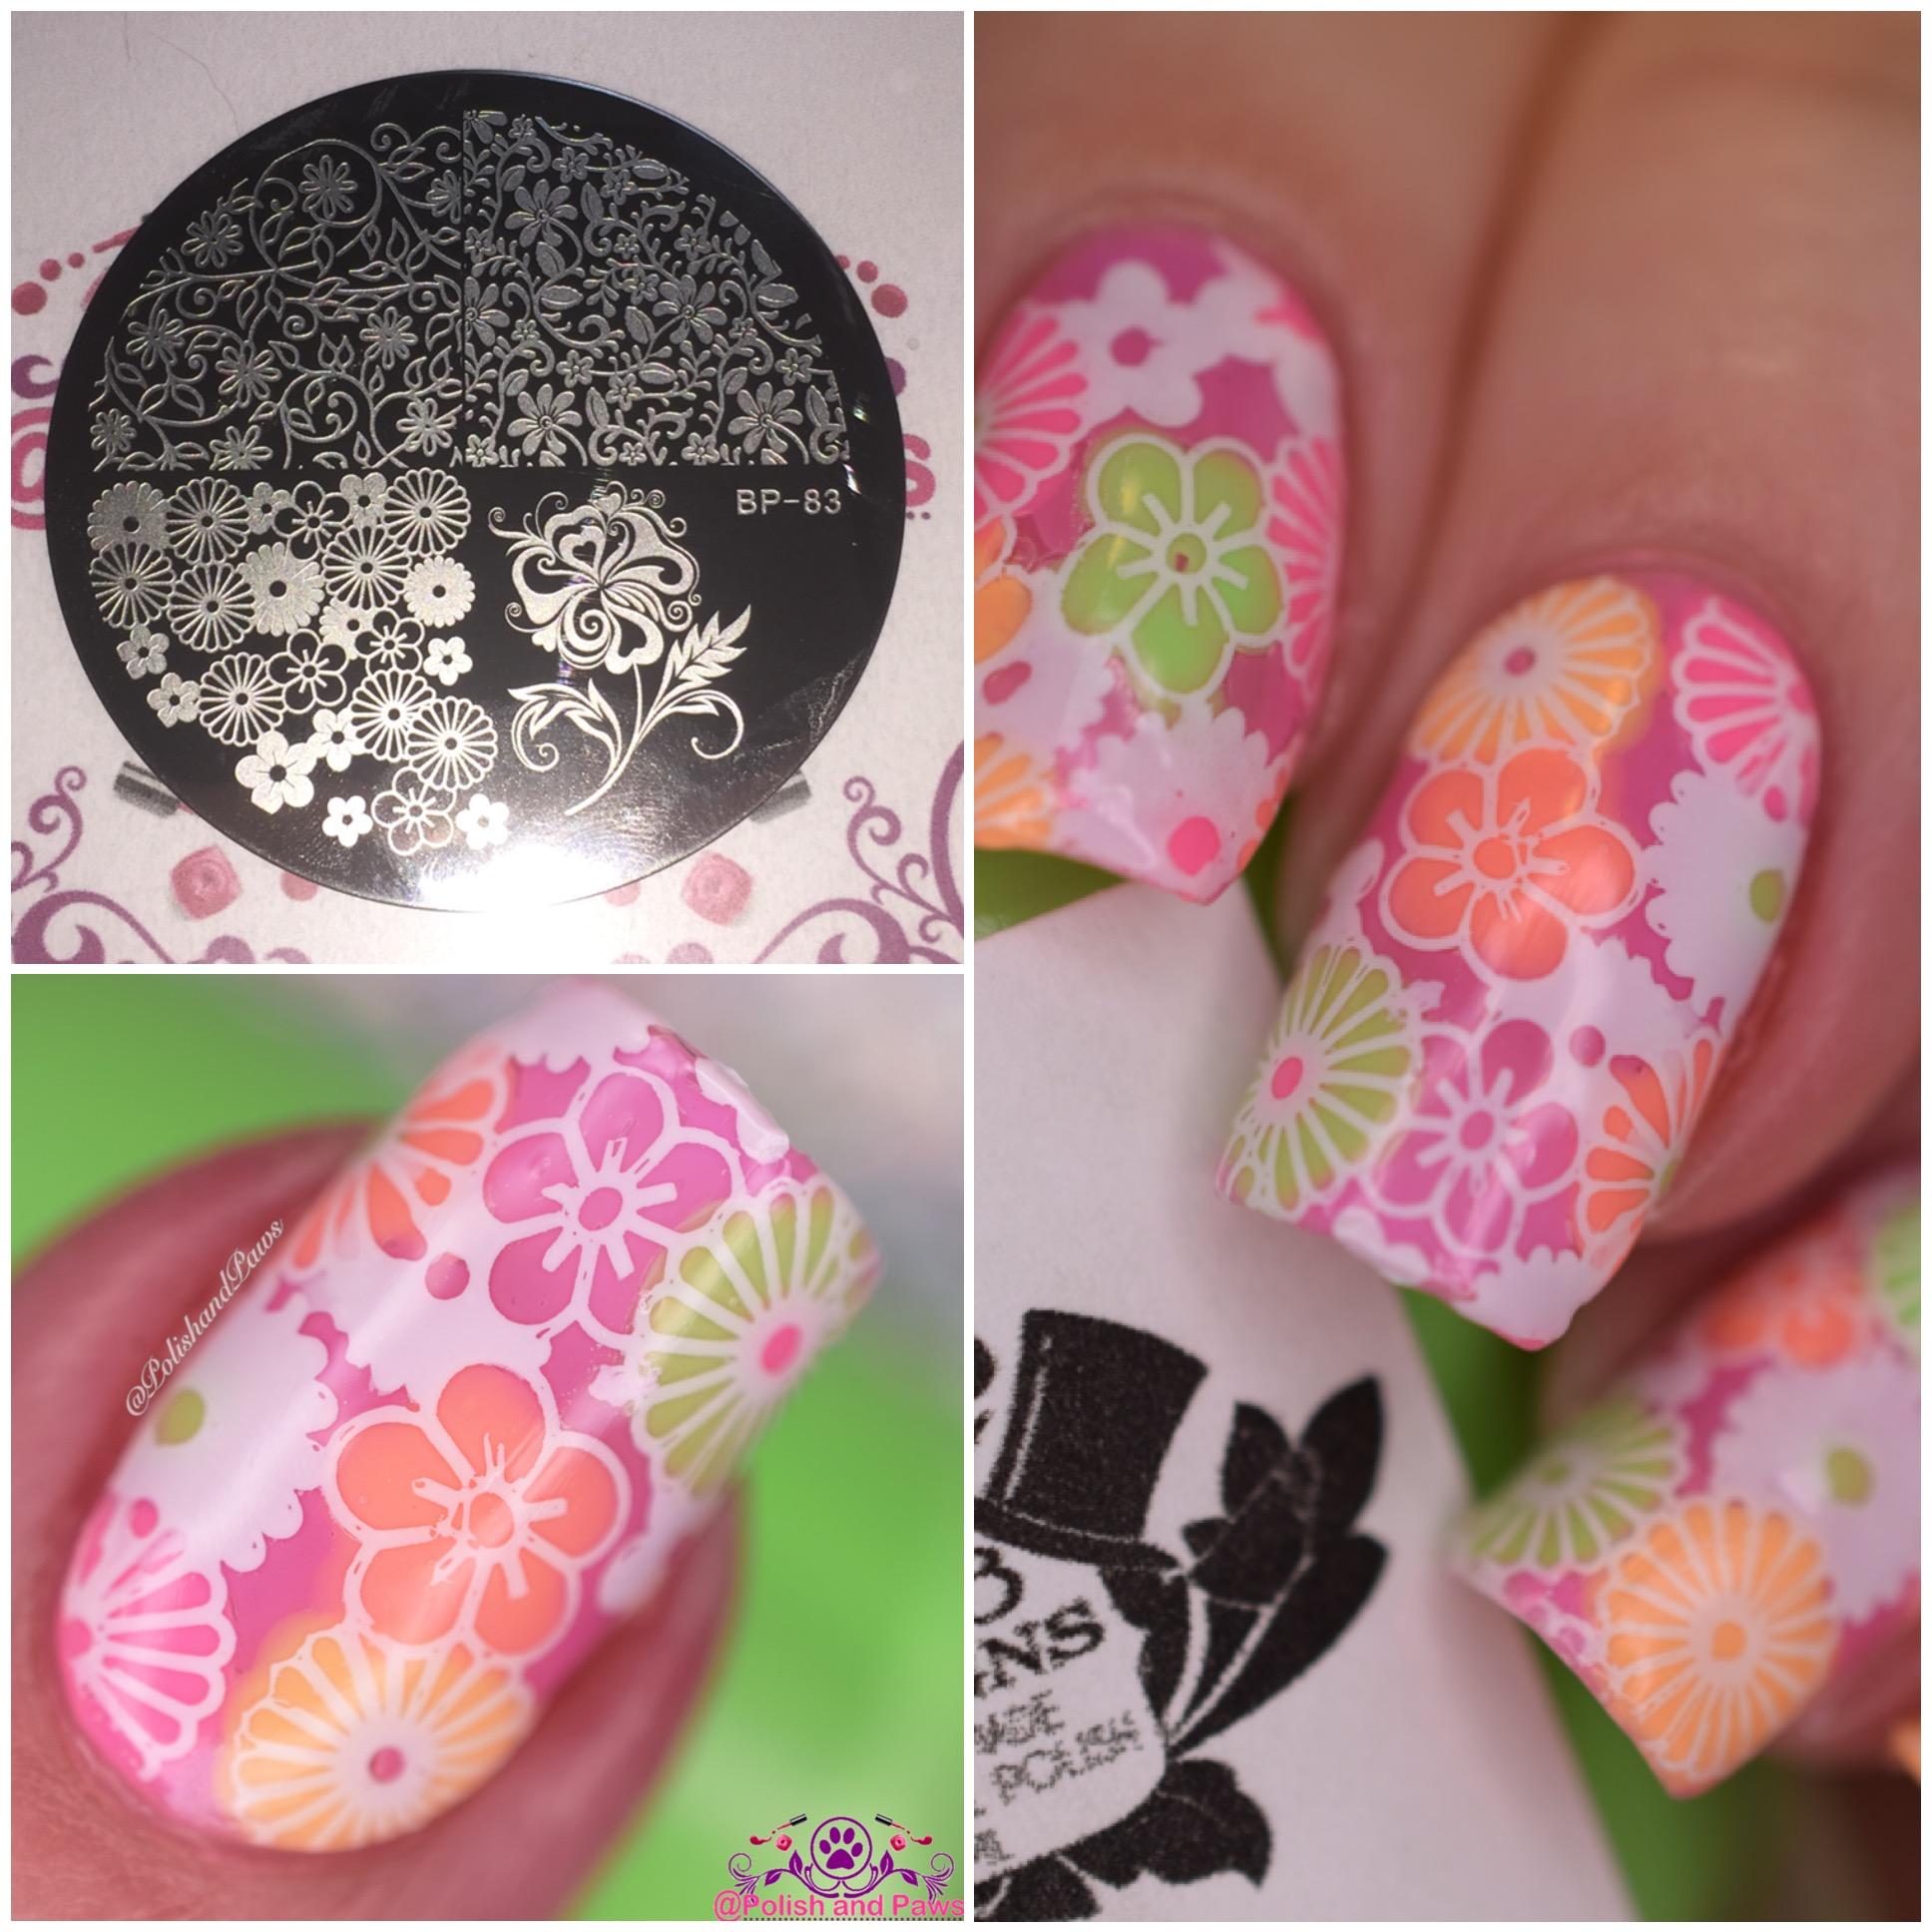 Nail Cake Born Pretty Store Review: Nail Art ~ Born Pretty Store BP-83